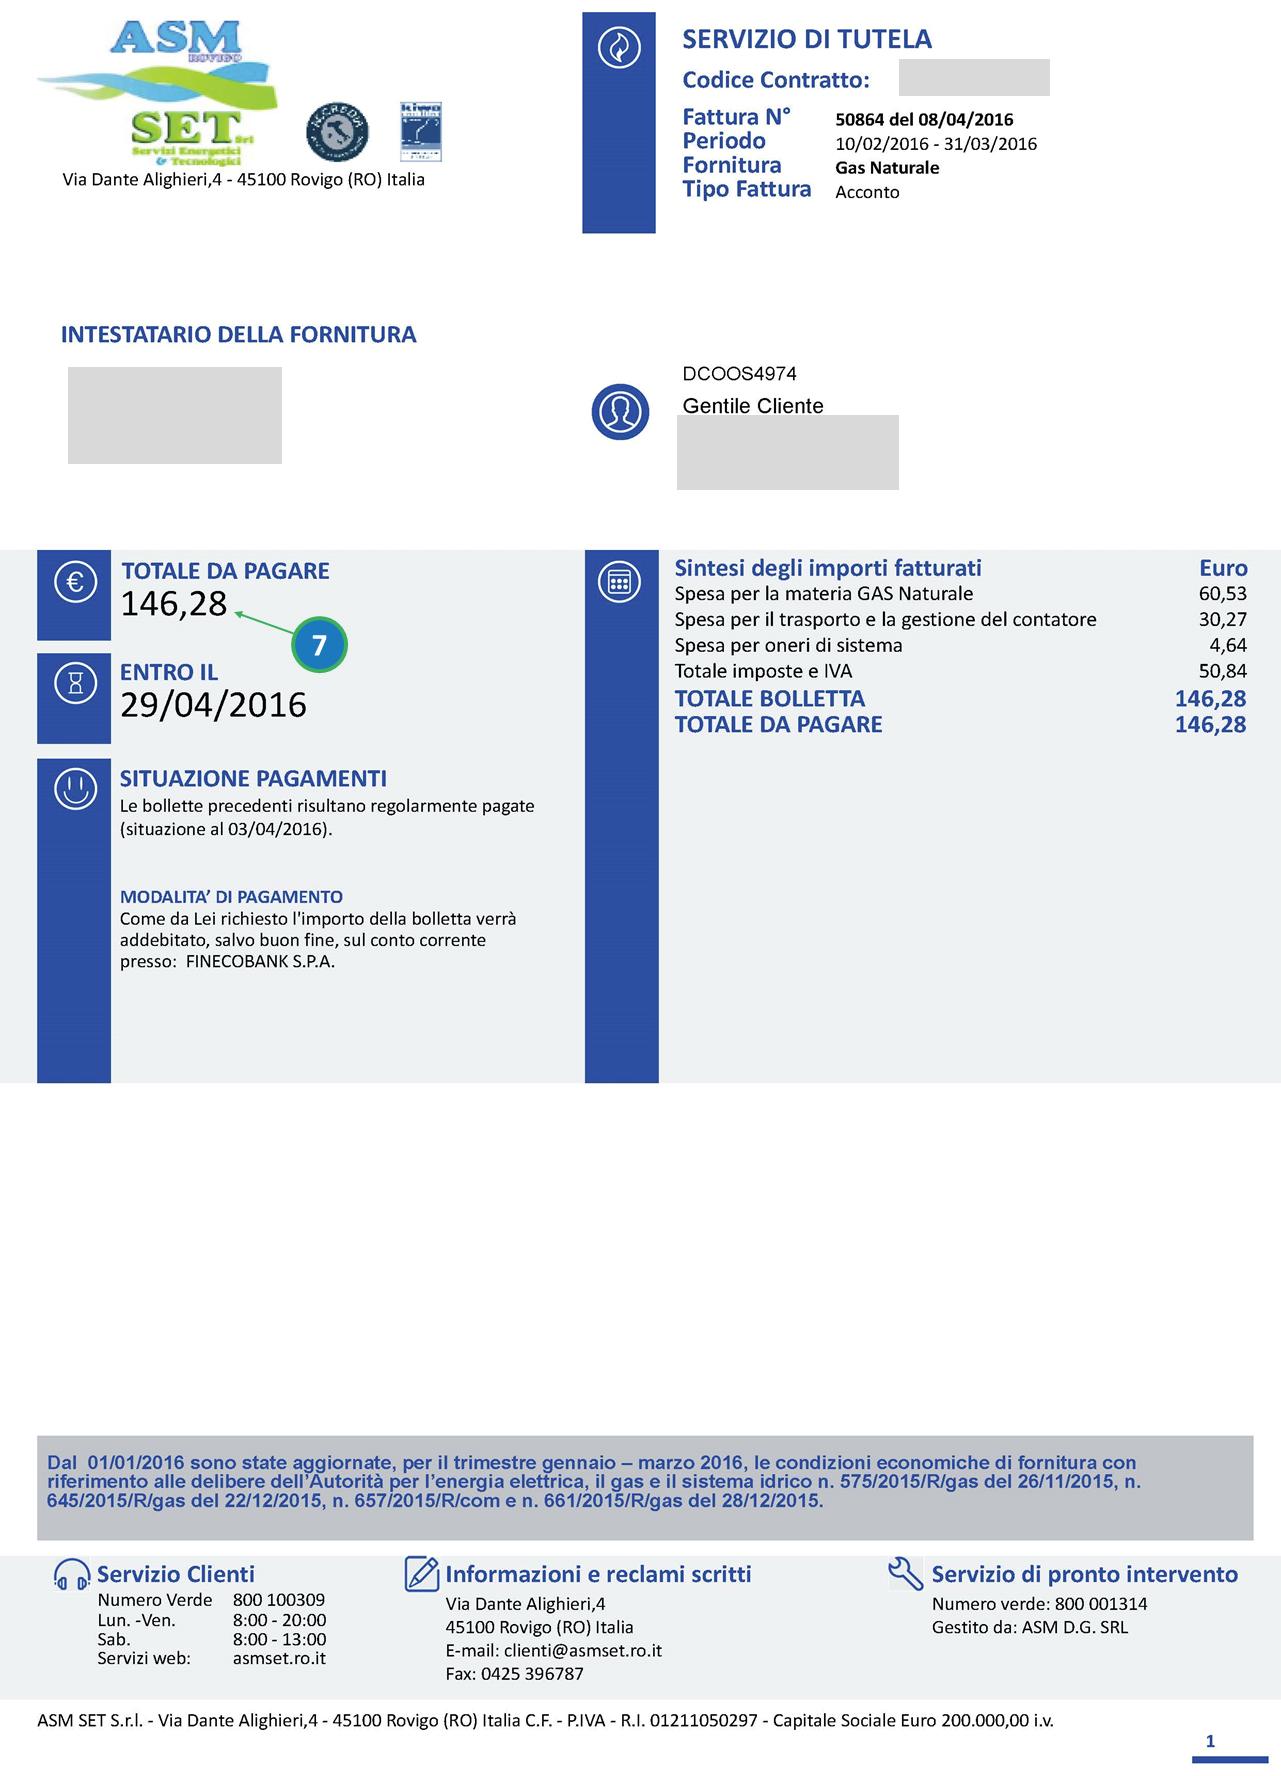 Bolletta_New_1.png